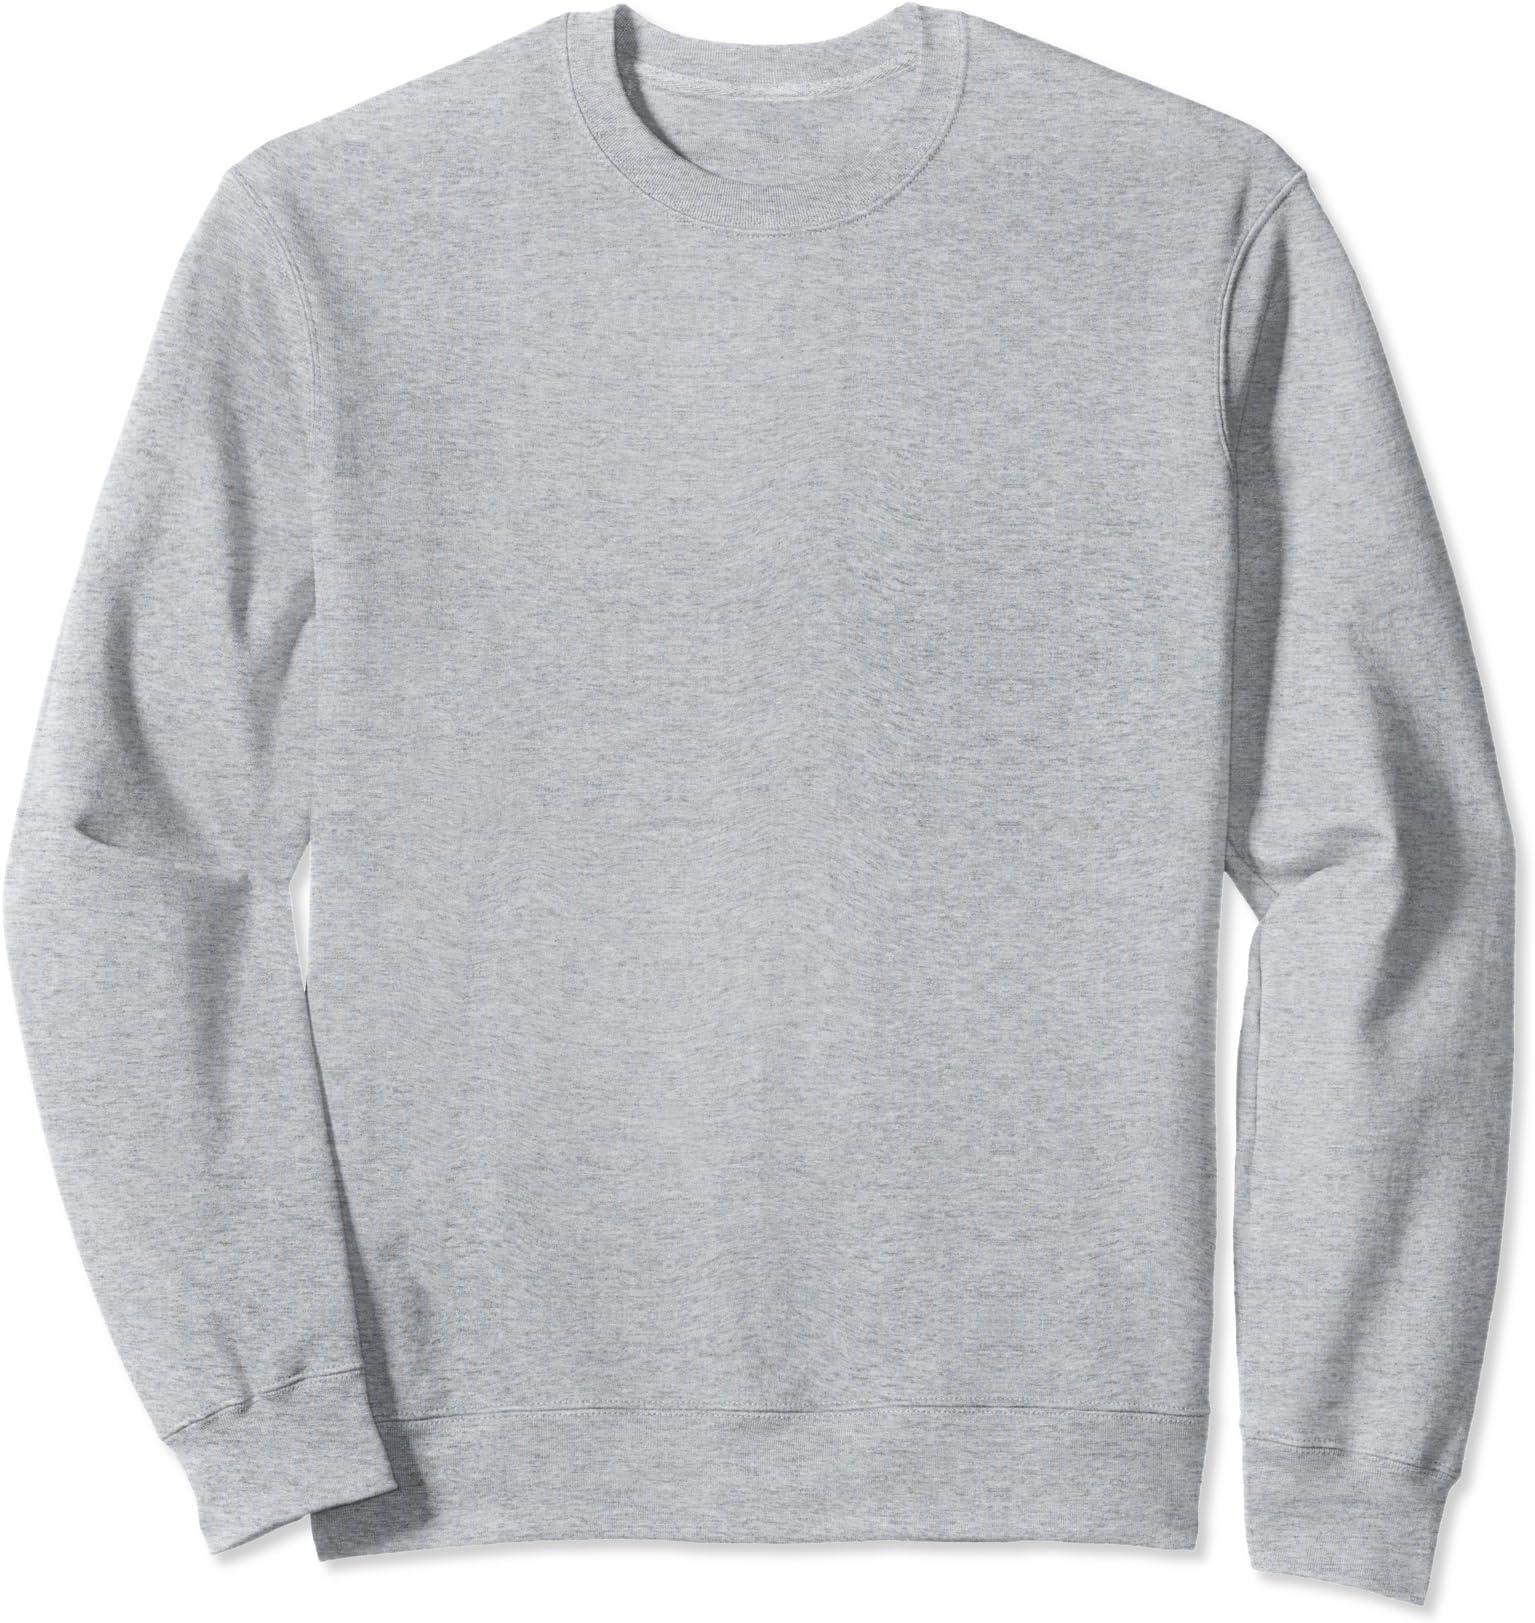 Alice in Wonderland Black /& White Flowers Adults Unisex Black Sweatshirt